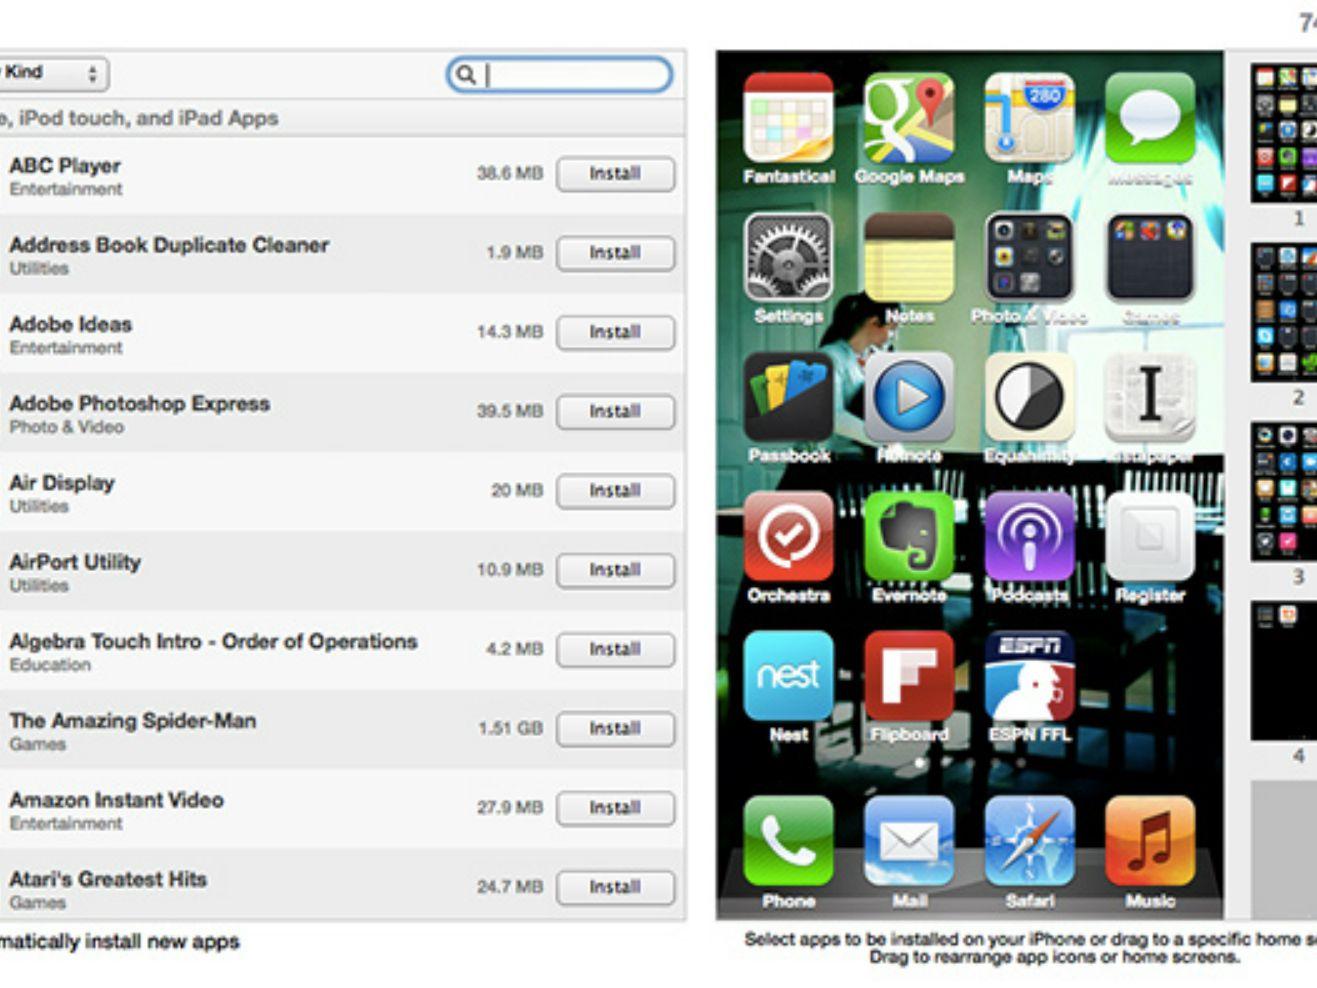 Cydia hook up Apps